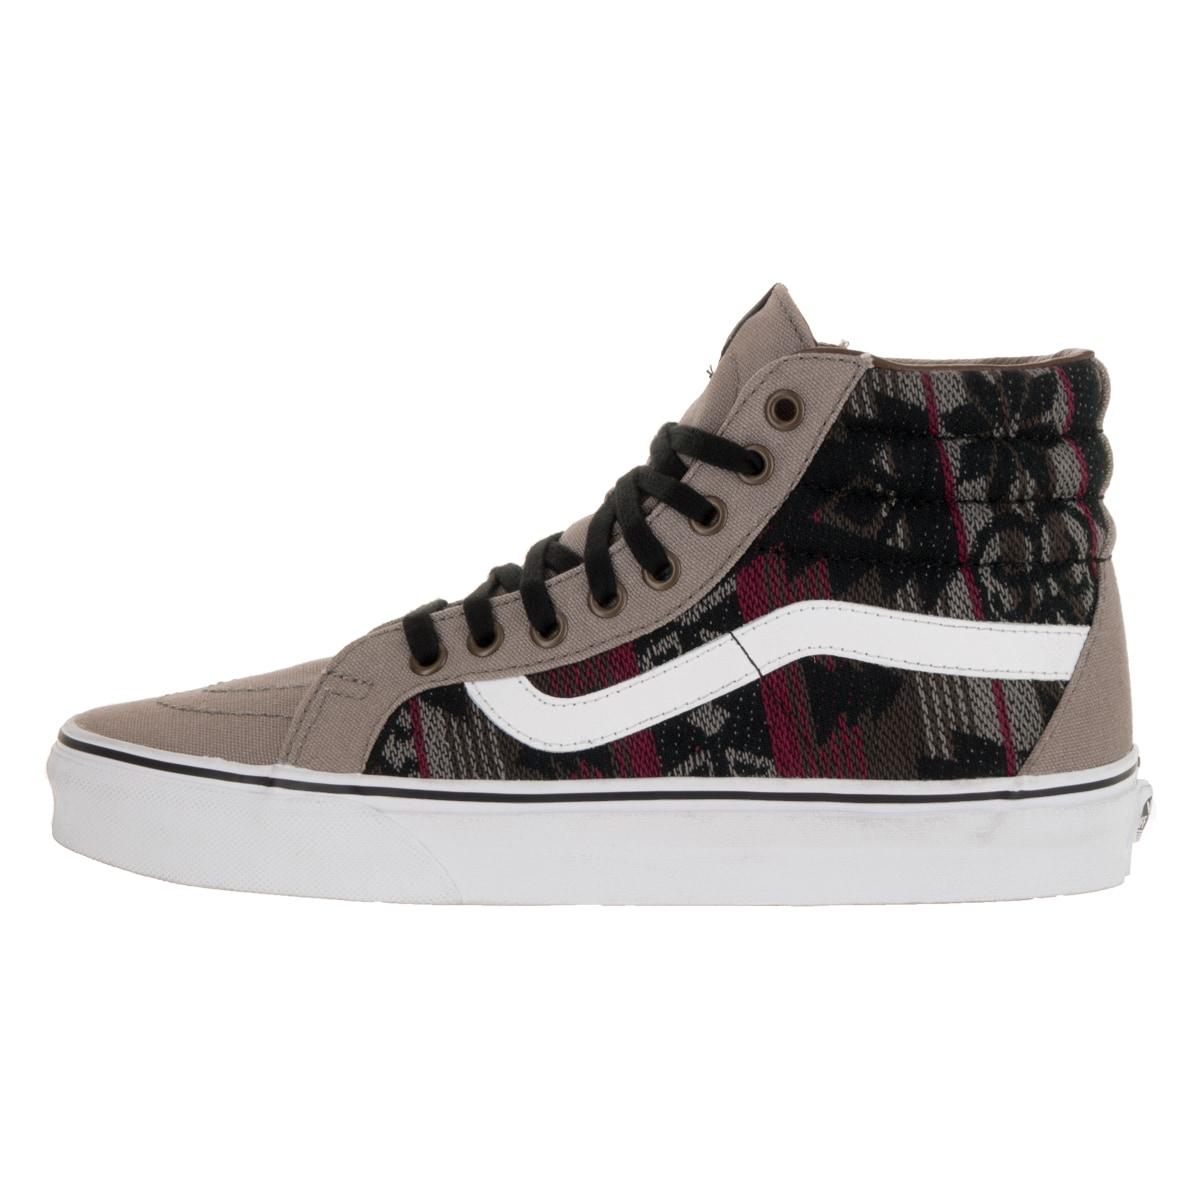 Vans Unisex Sk8-Hi Reissue (Inca) Moon Rock/Dachshund Skate Shoe - Free  Shipping Today - Overstock.com - 20091827